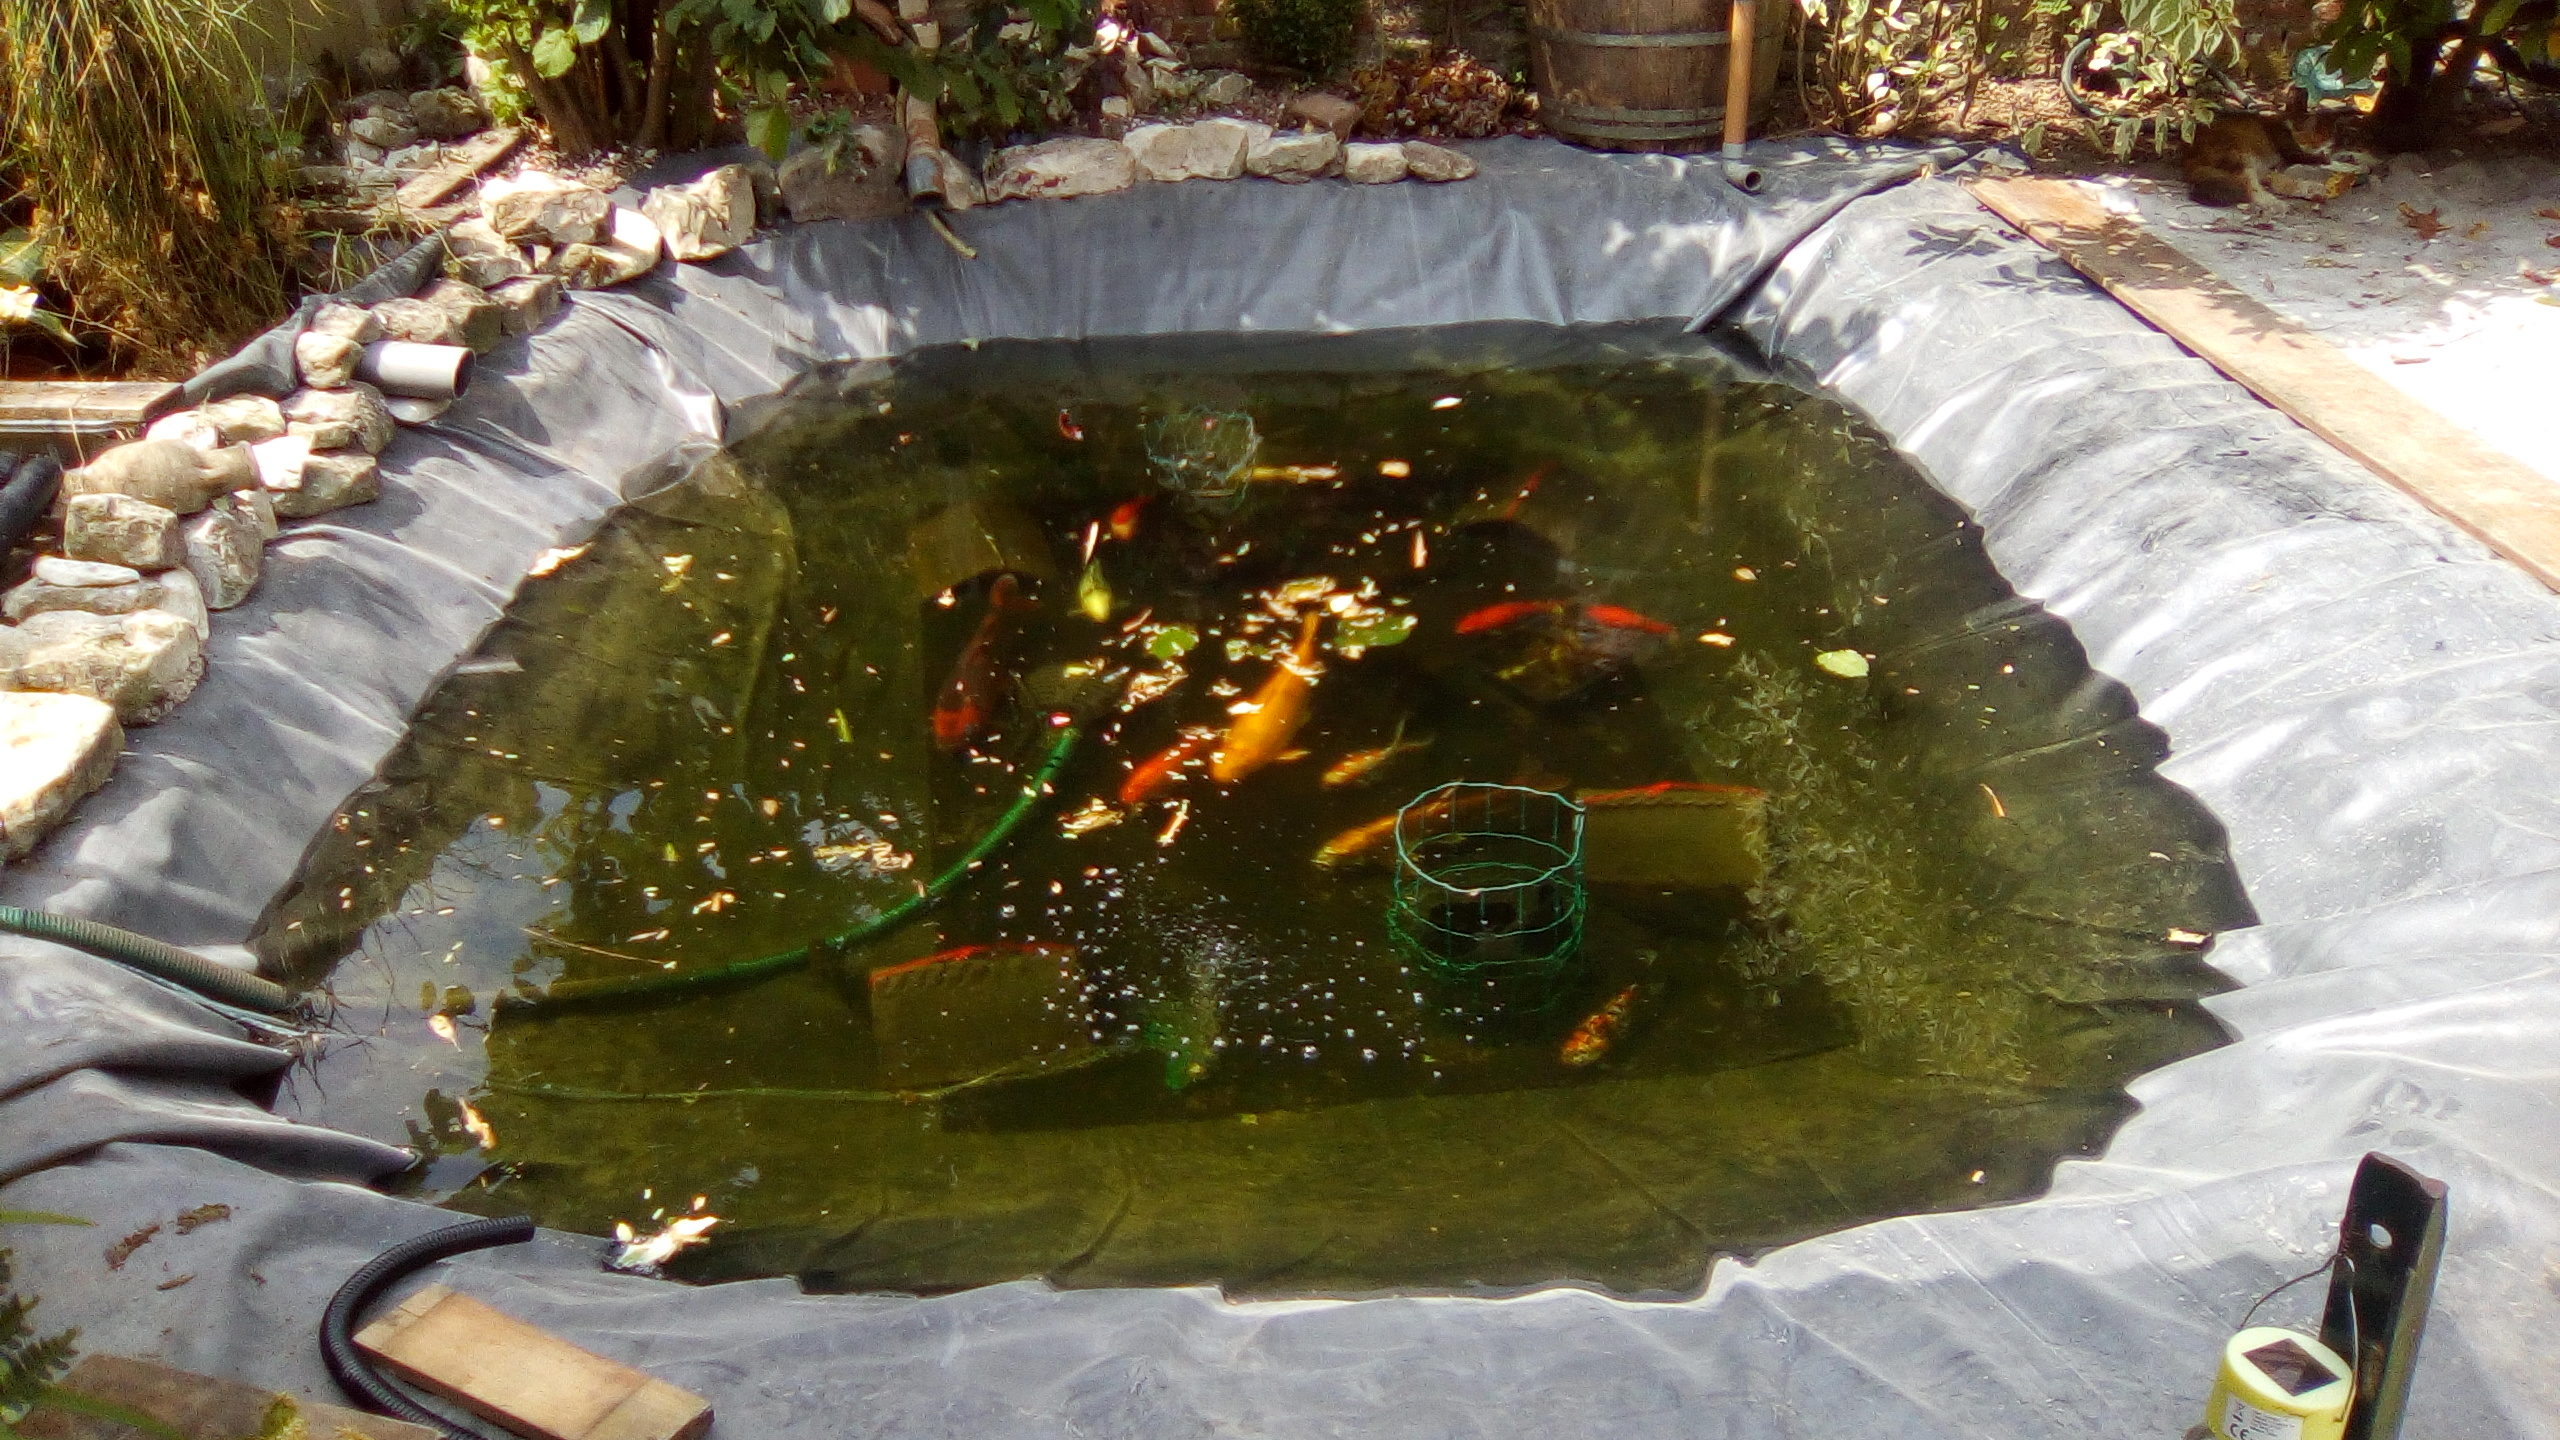 Bassin A Poisson Rouge restauration bassin - forum aquajardin - bassin koï, mare, étang